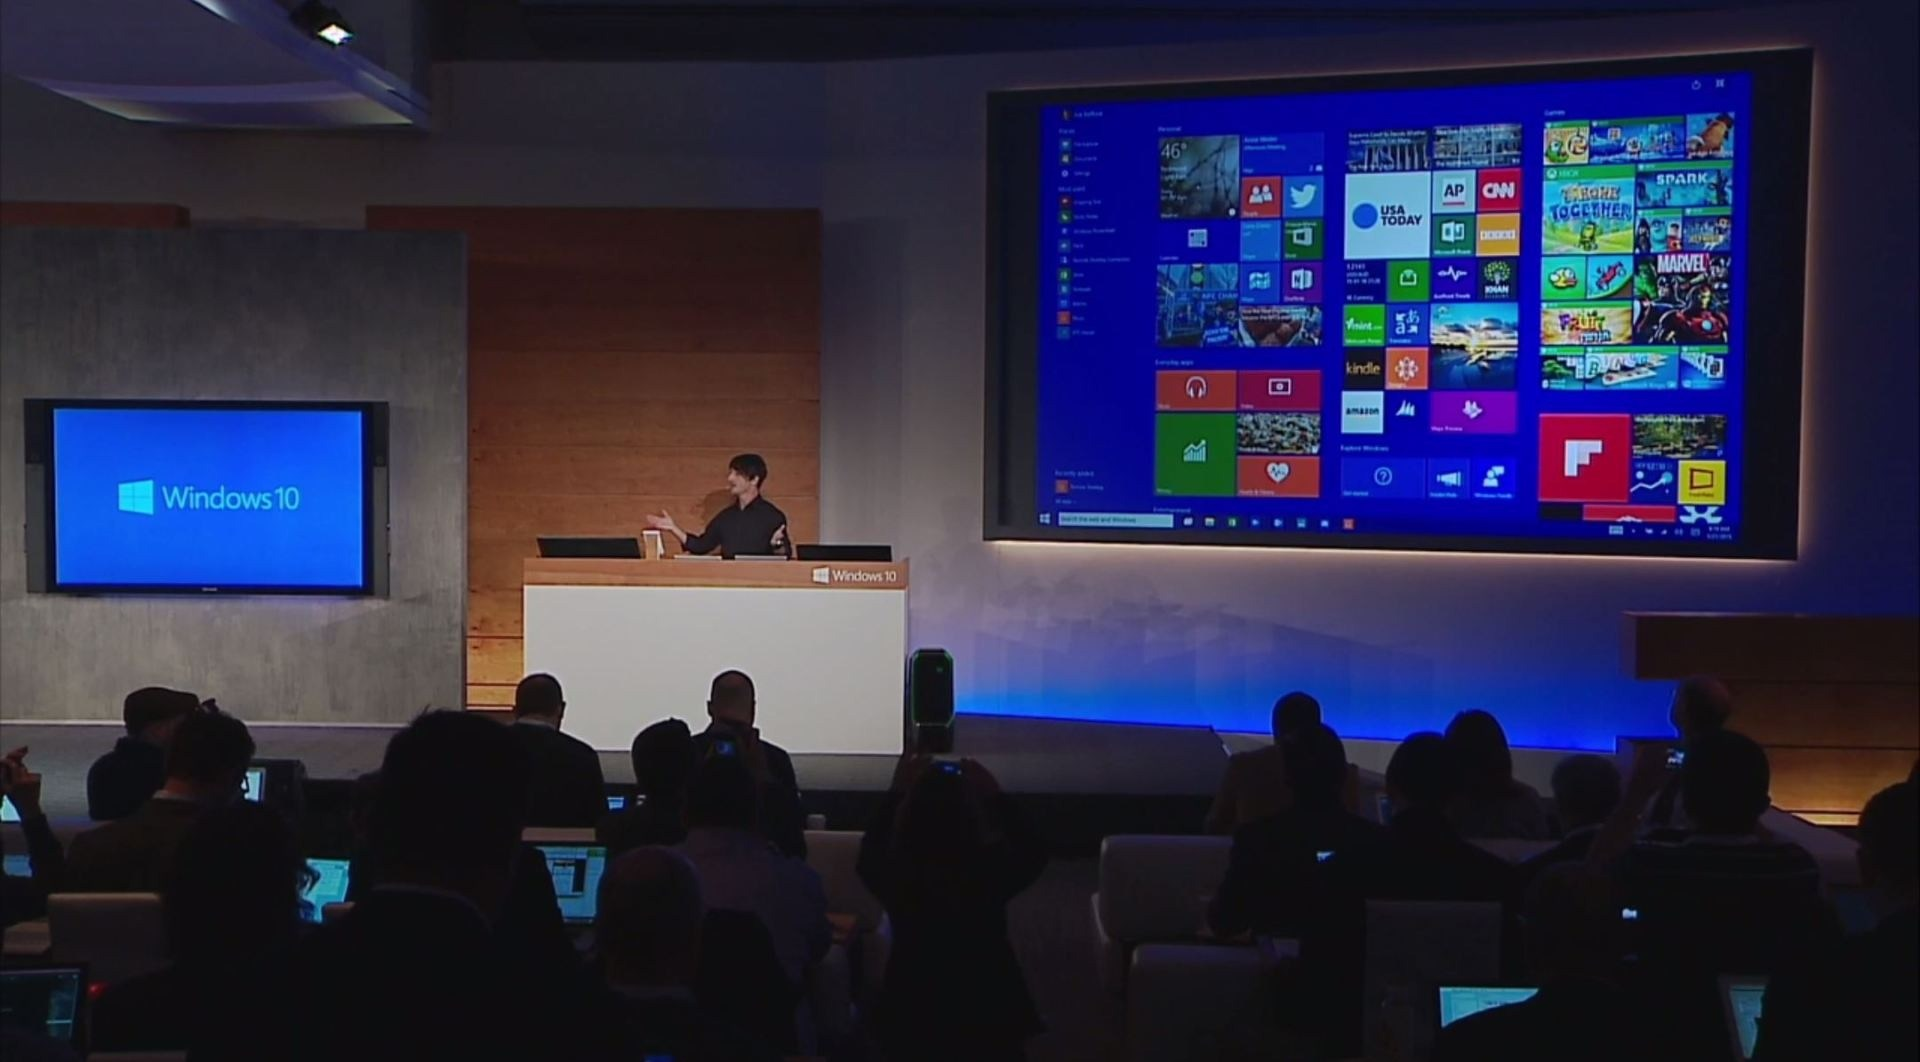 Neuer Windows-10-Build nächste Woche; Mobile-Preview im Februar